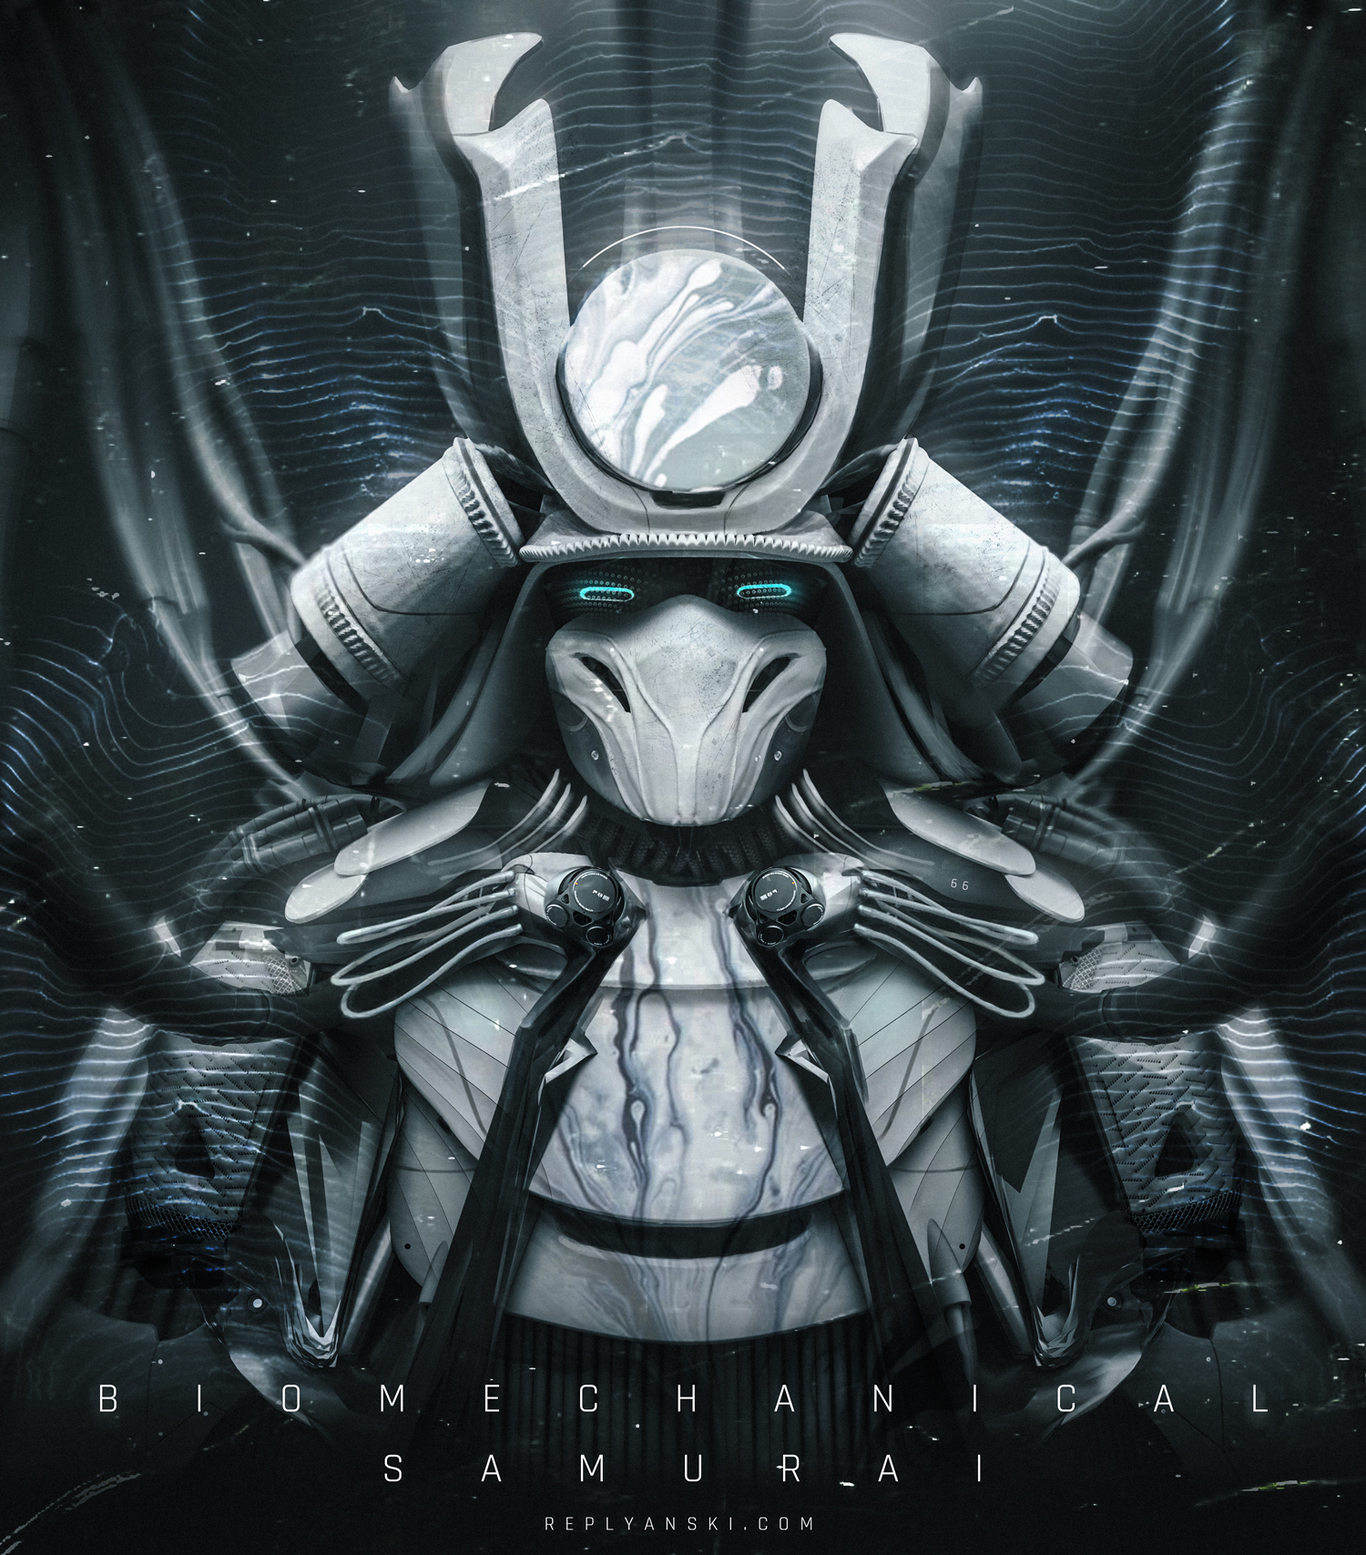 Biomechanical Samurai By Replyanski Robotic Cyborg 2d